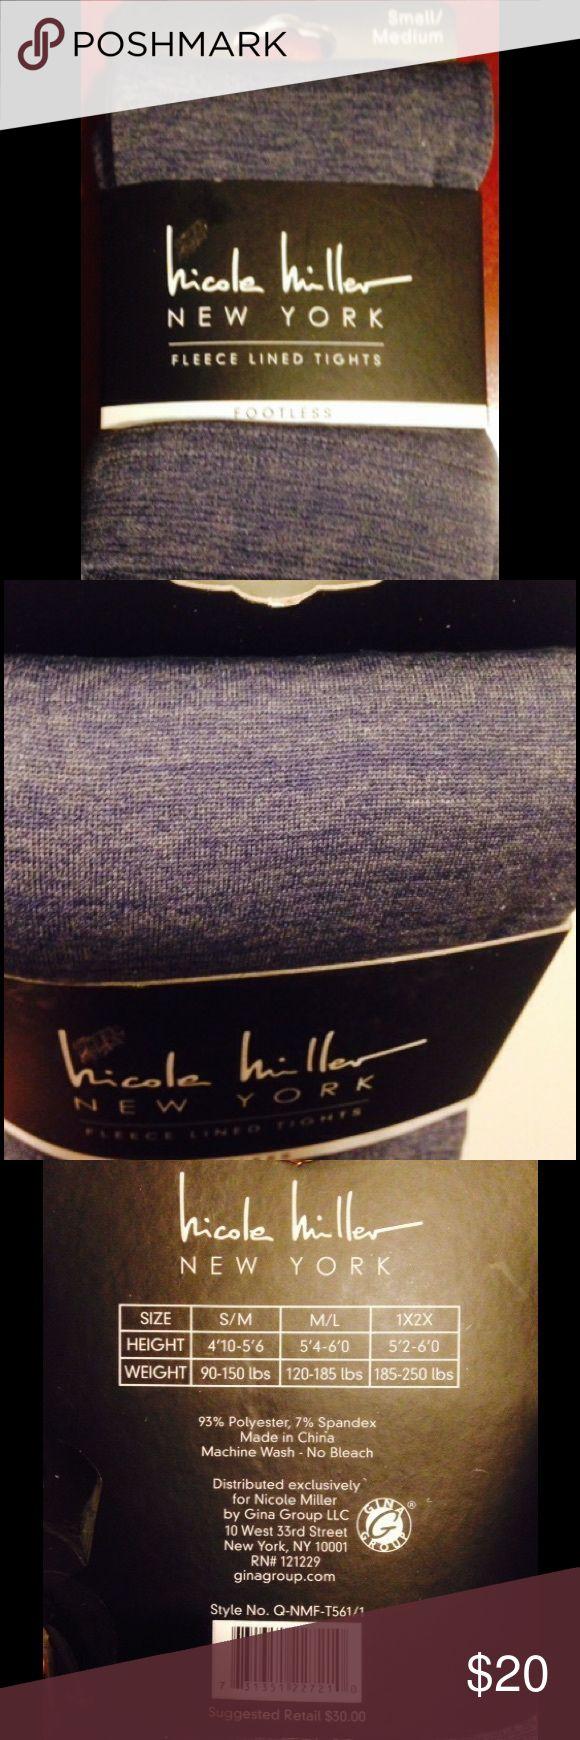 💋Nicole Miller-Fleece lined, footless tights💋 🌟Nicole Miller-fleece lined, footless tights! Blue/Jean colored🌟 Nicole Miller Accessories Hosiery & Socks